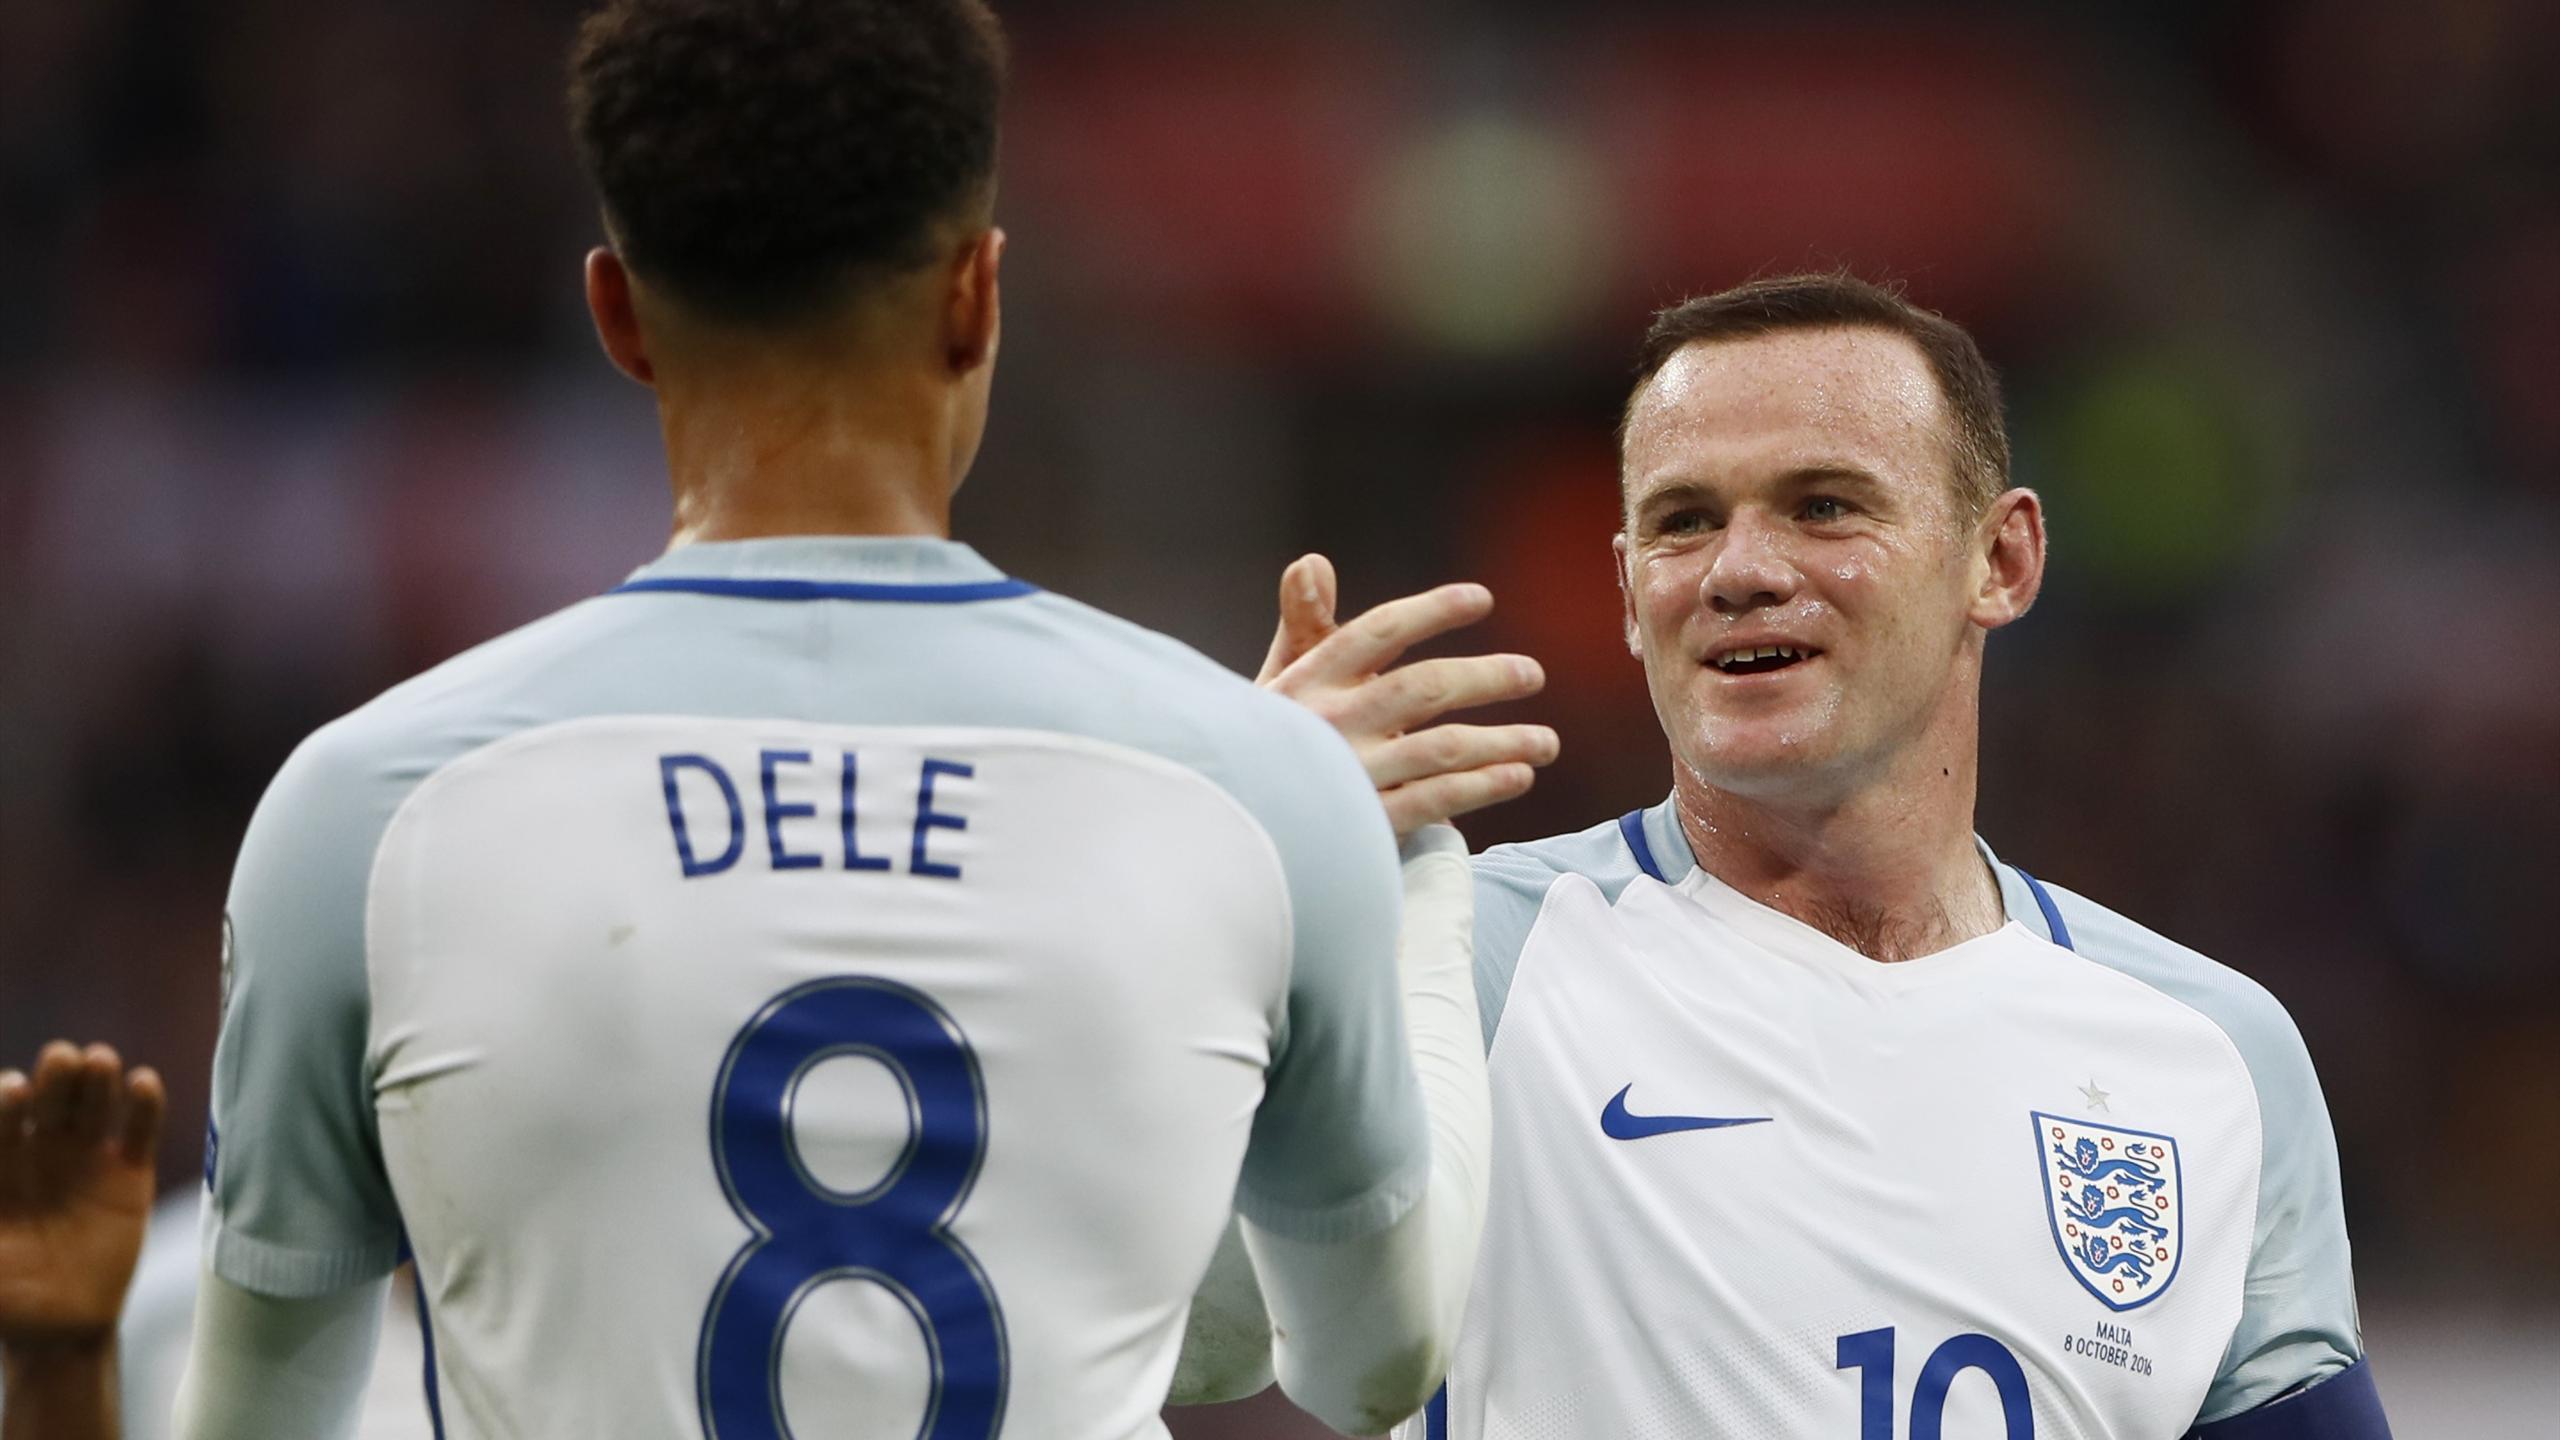 England's Dele Alli celebrates scoring their second goal with Wayne Rooney